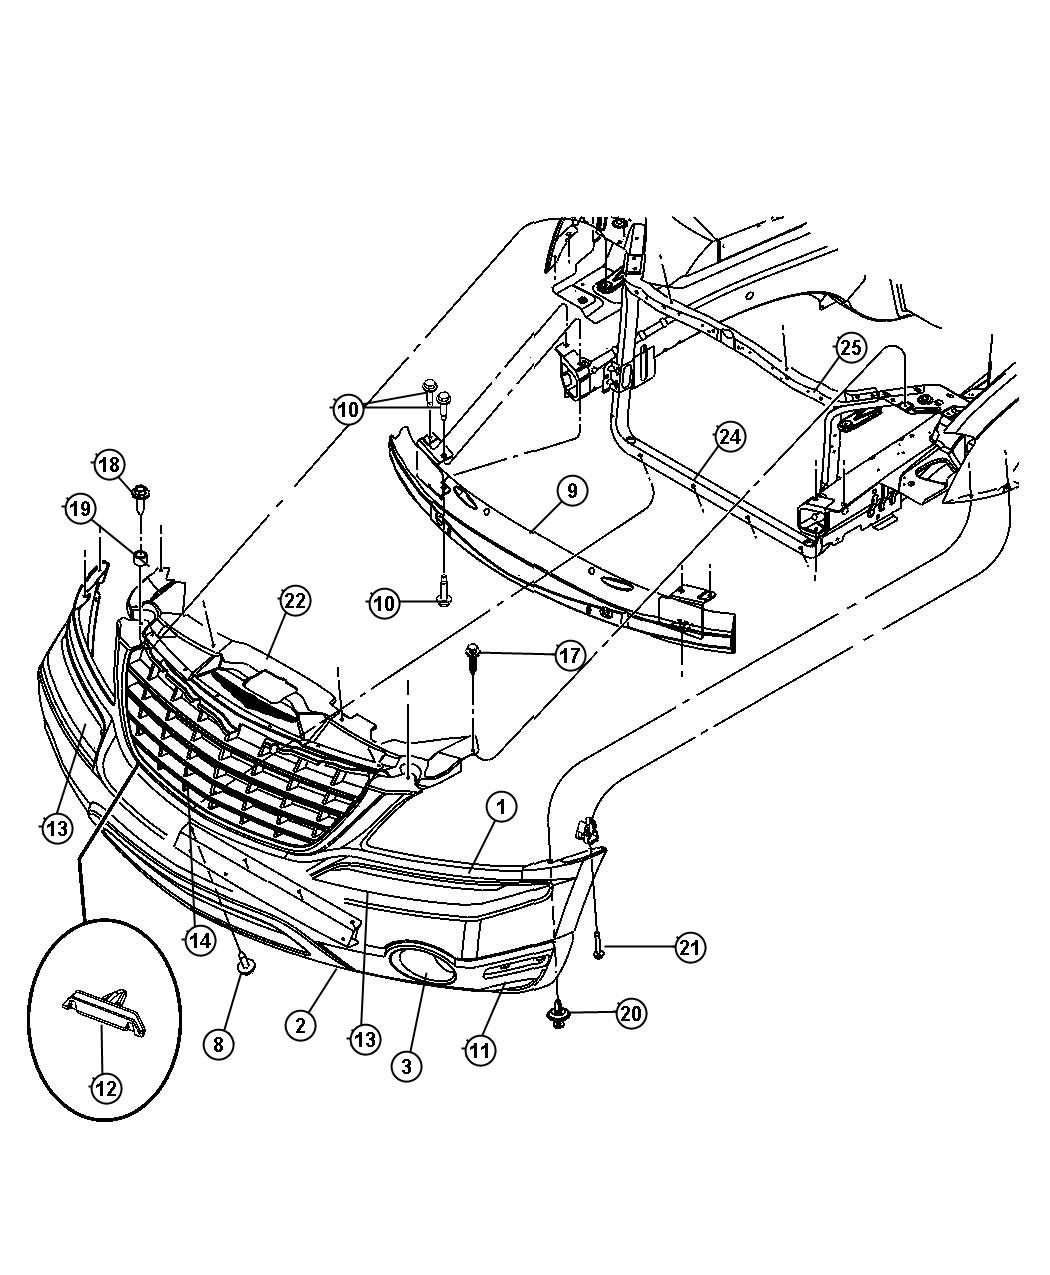 Wiring Diagram 34 Chrysler Pacifica Parts Diagram